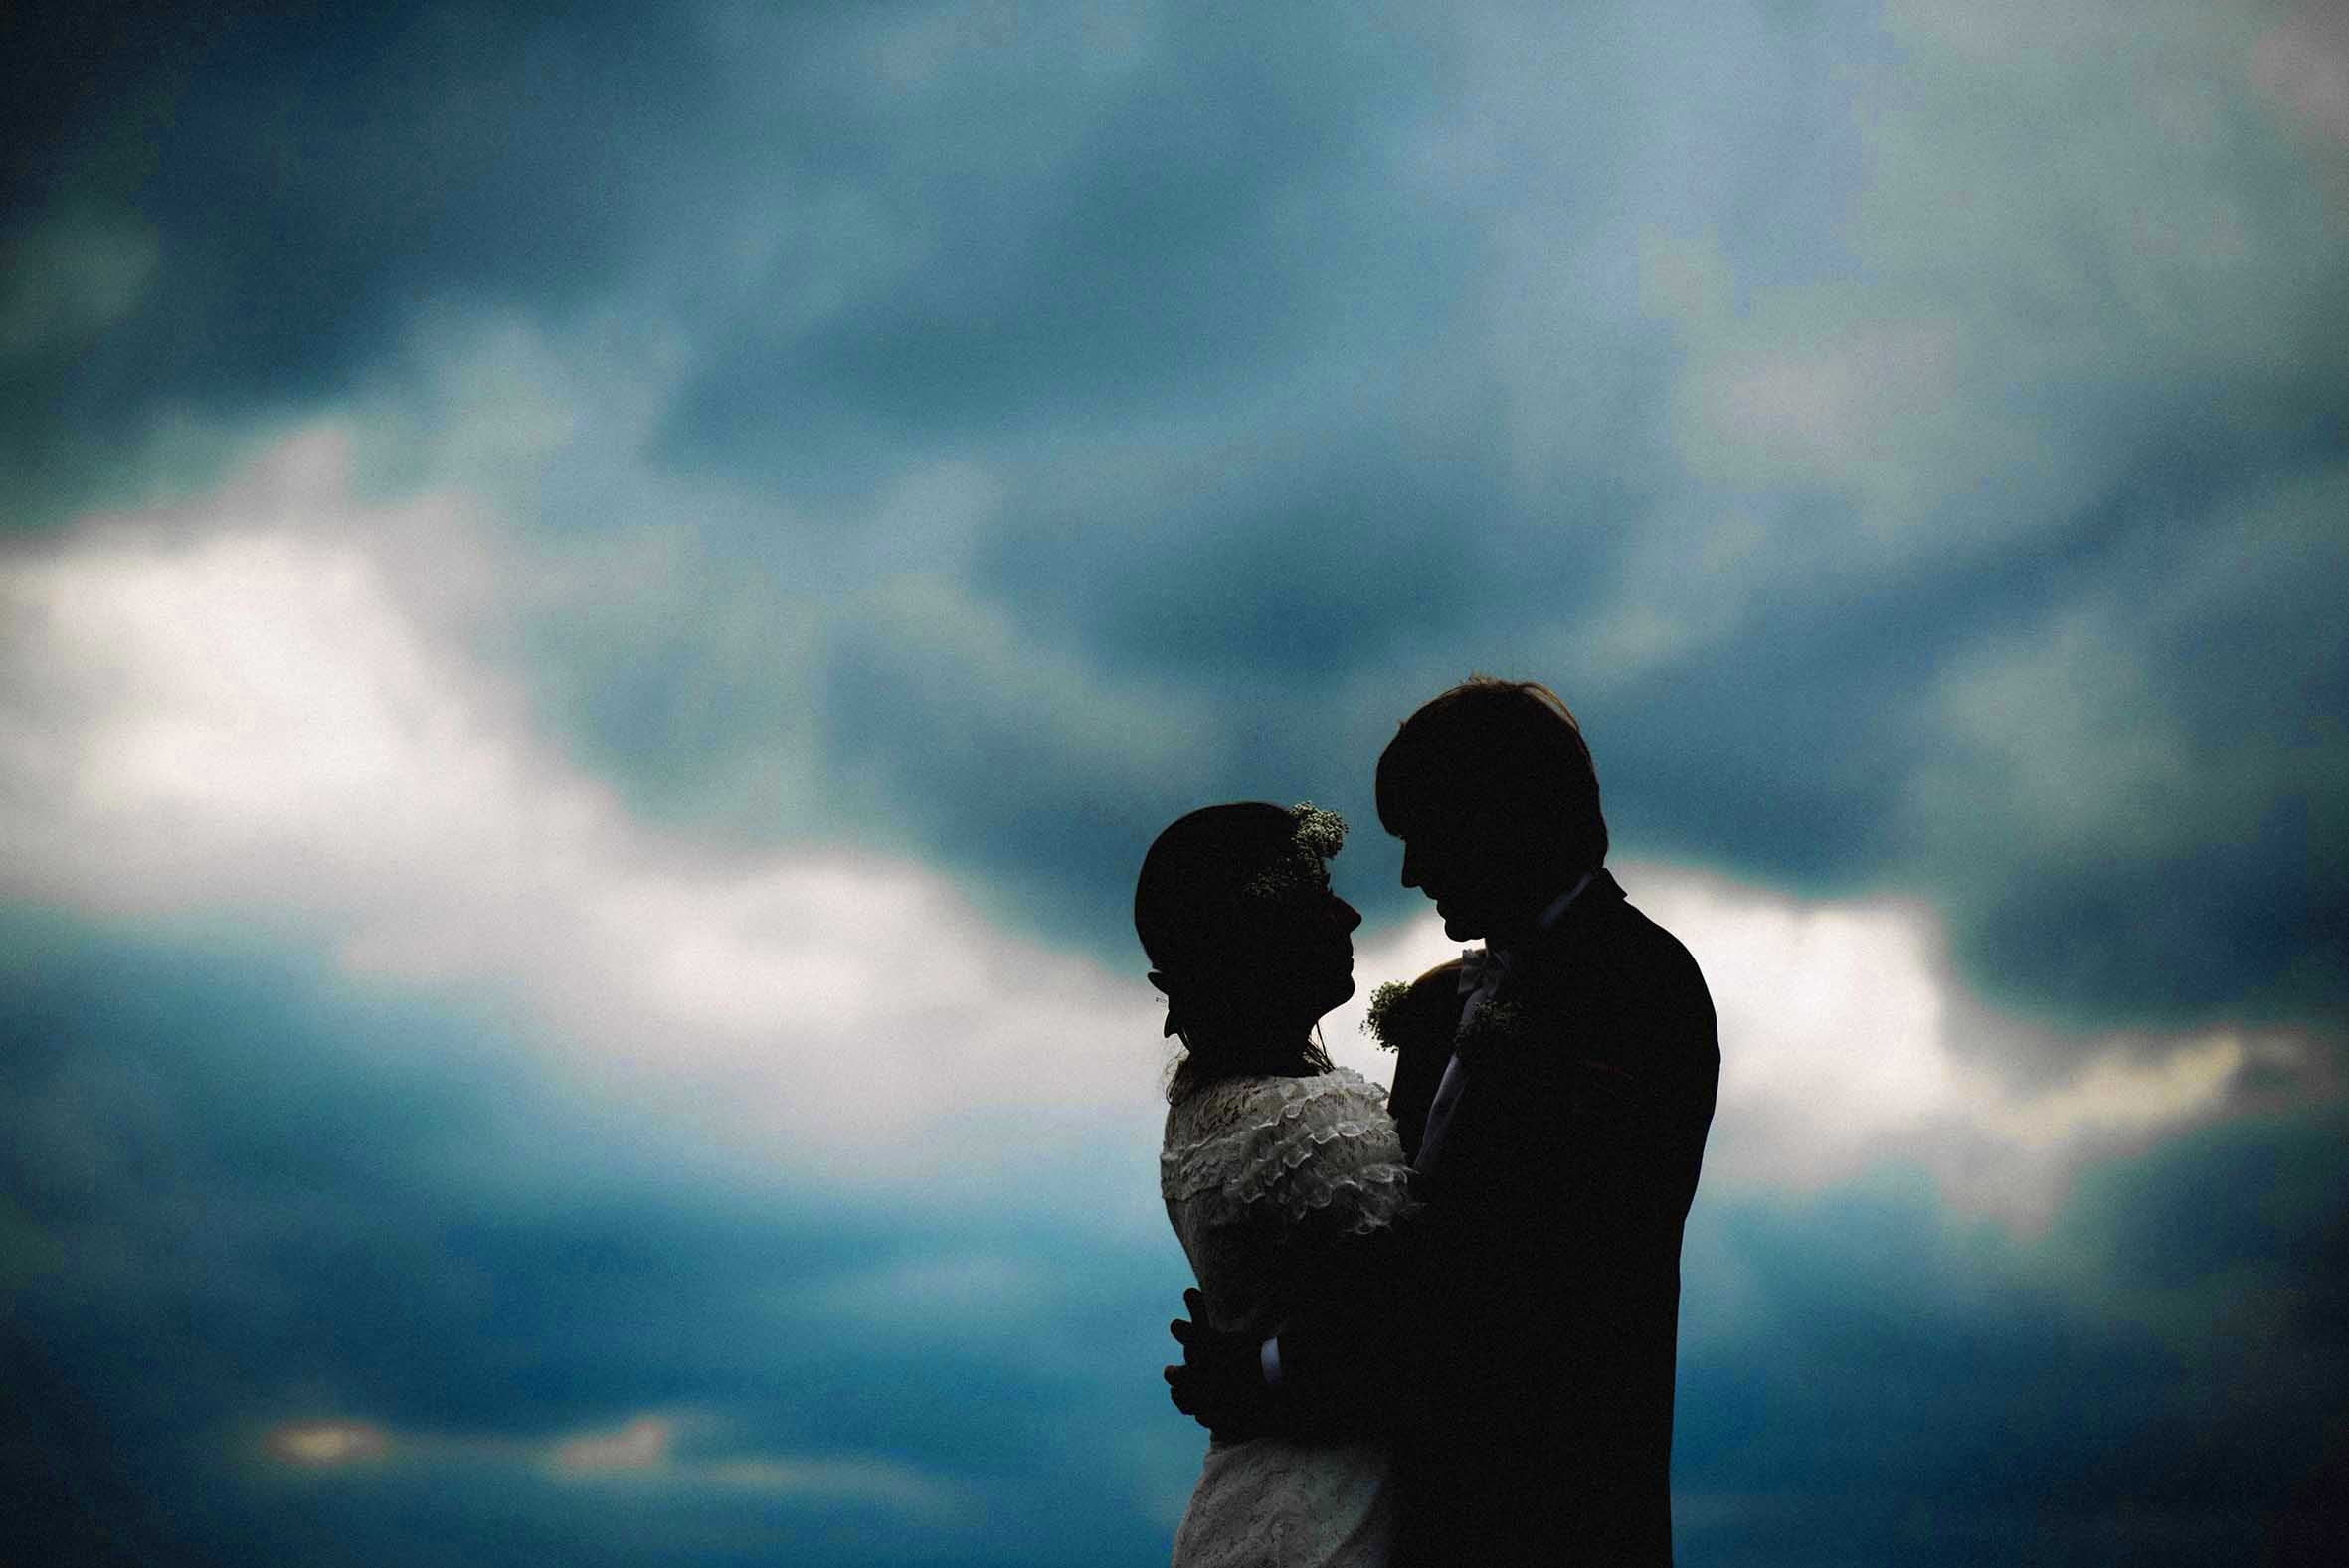 Dramatisk bilde svarte silhuetter, blå og mørk himmel, Oslos tak, bryllupsfotograf Oslo